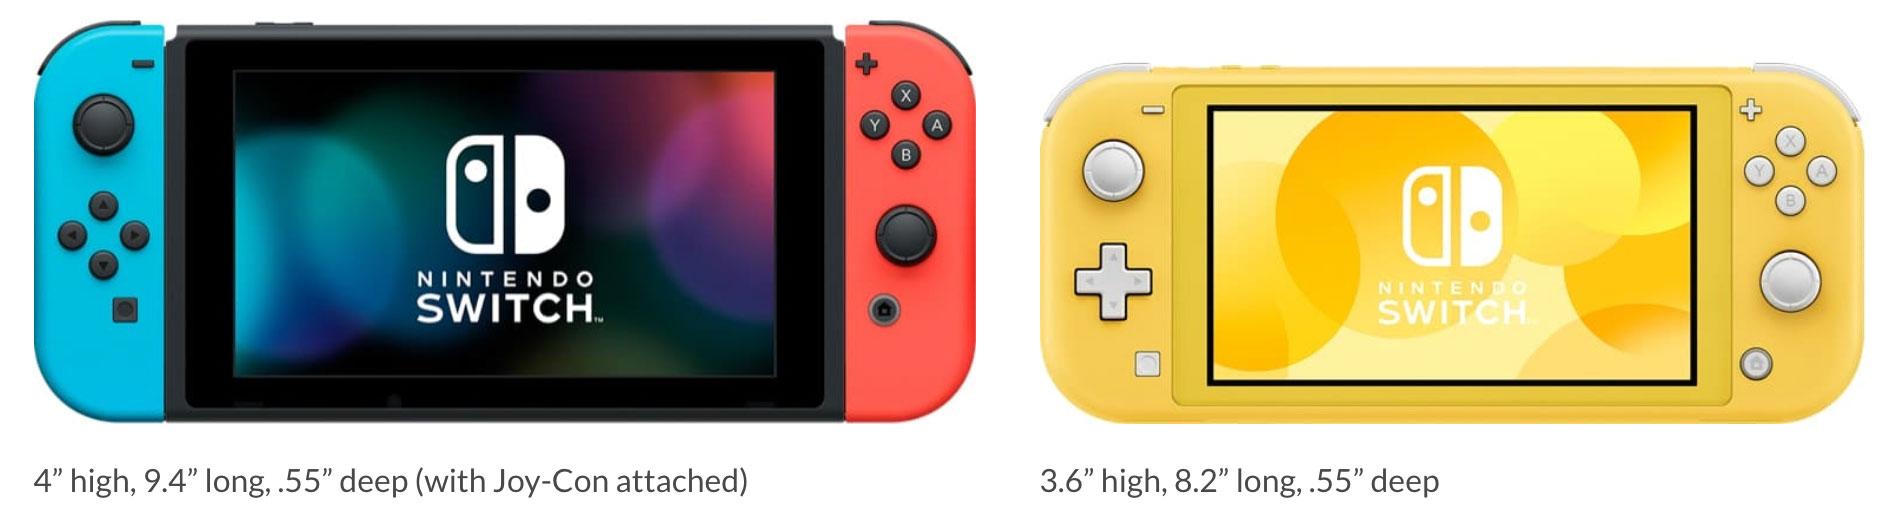 nintendo-switch-vs-nintendo-switch-lite